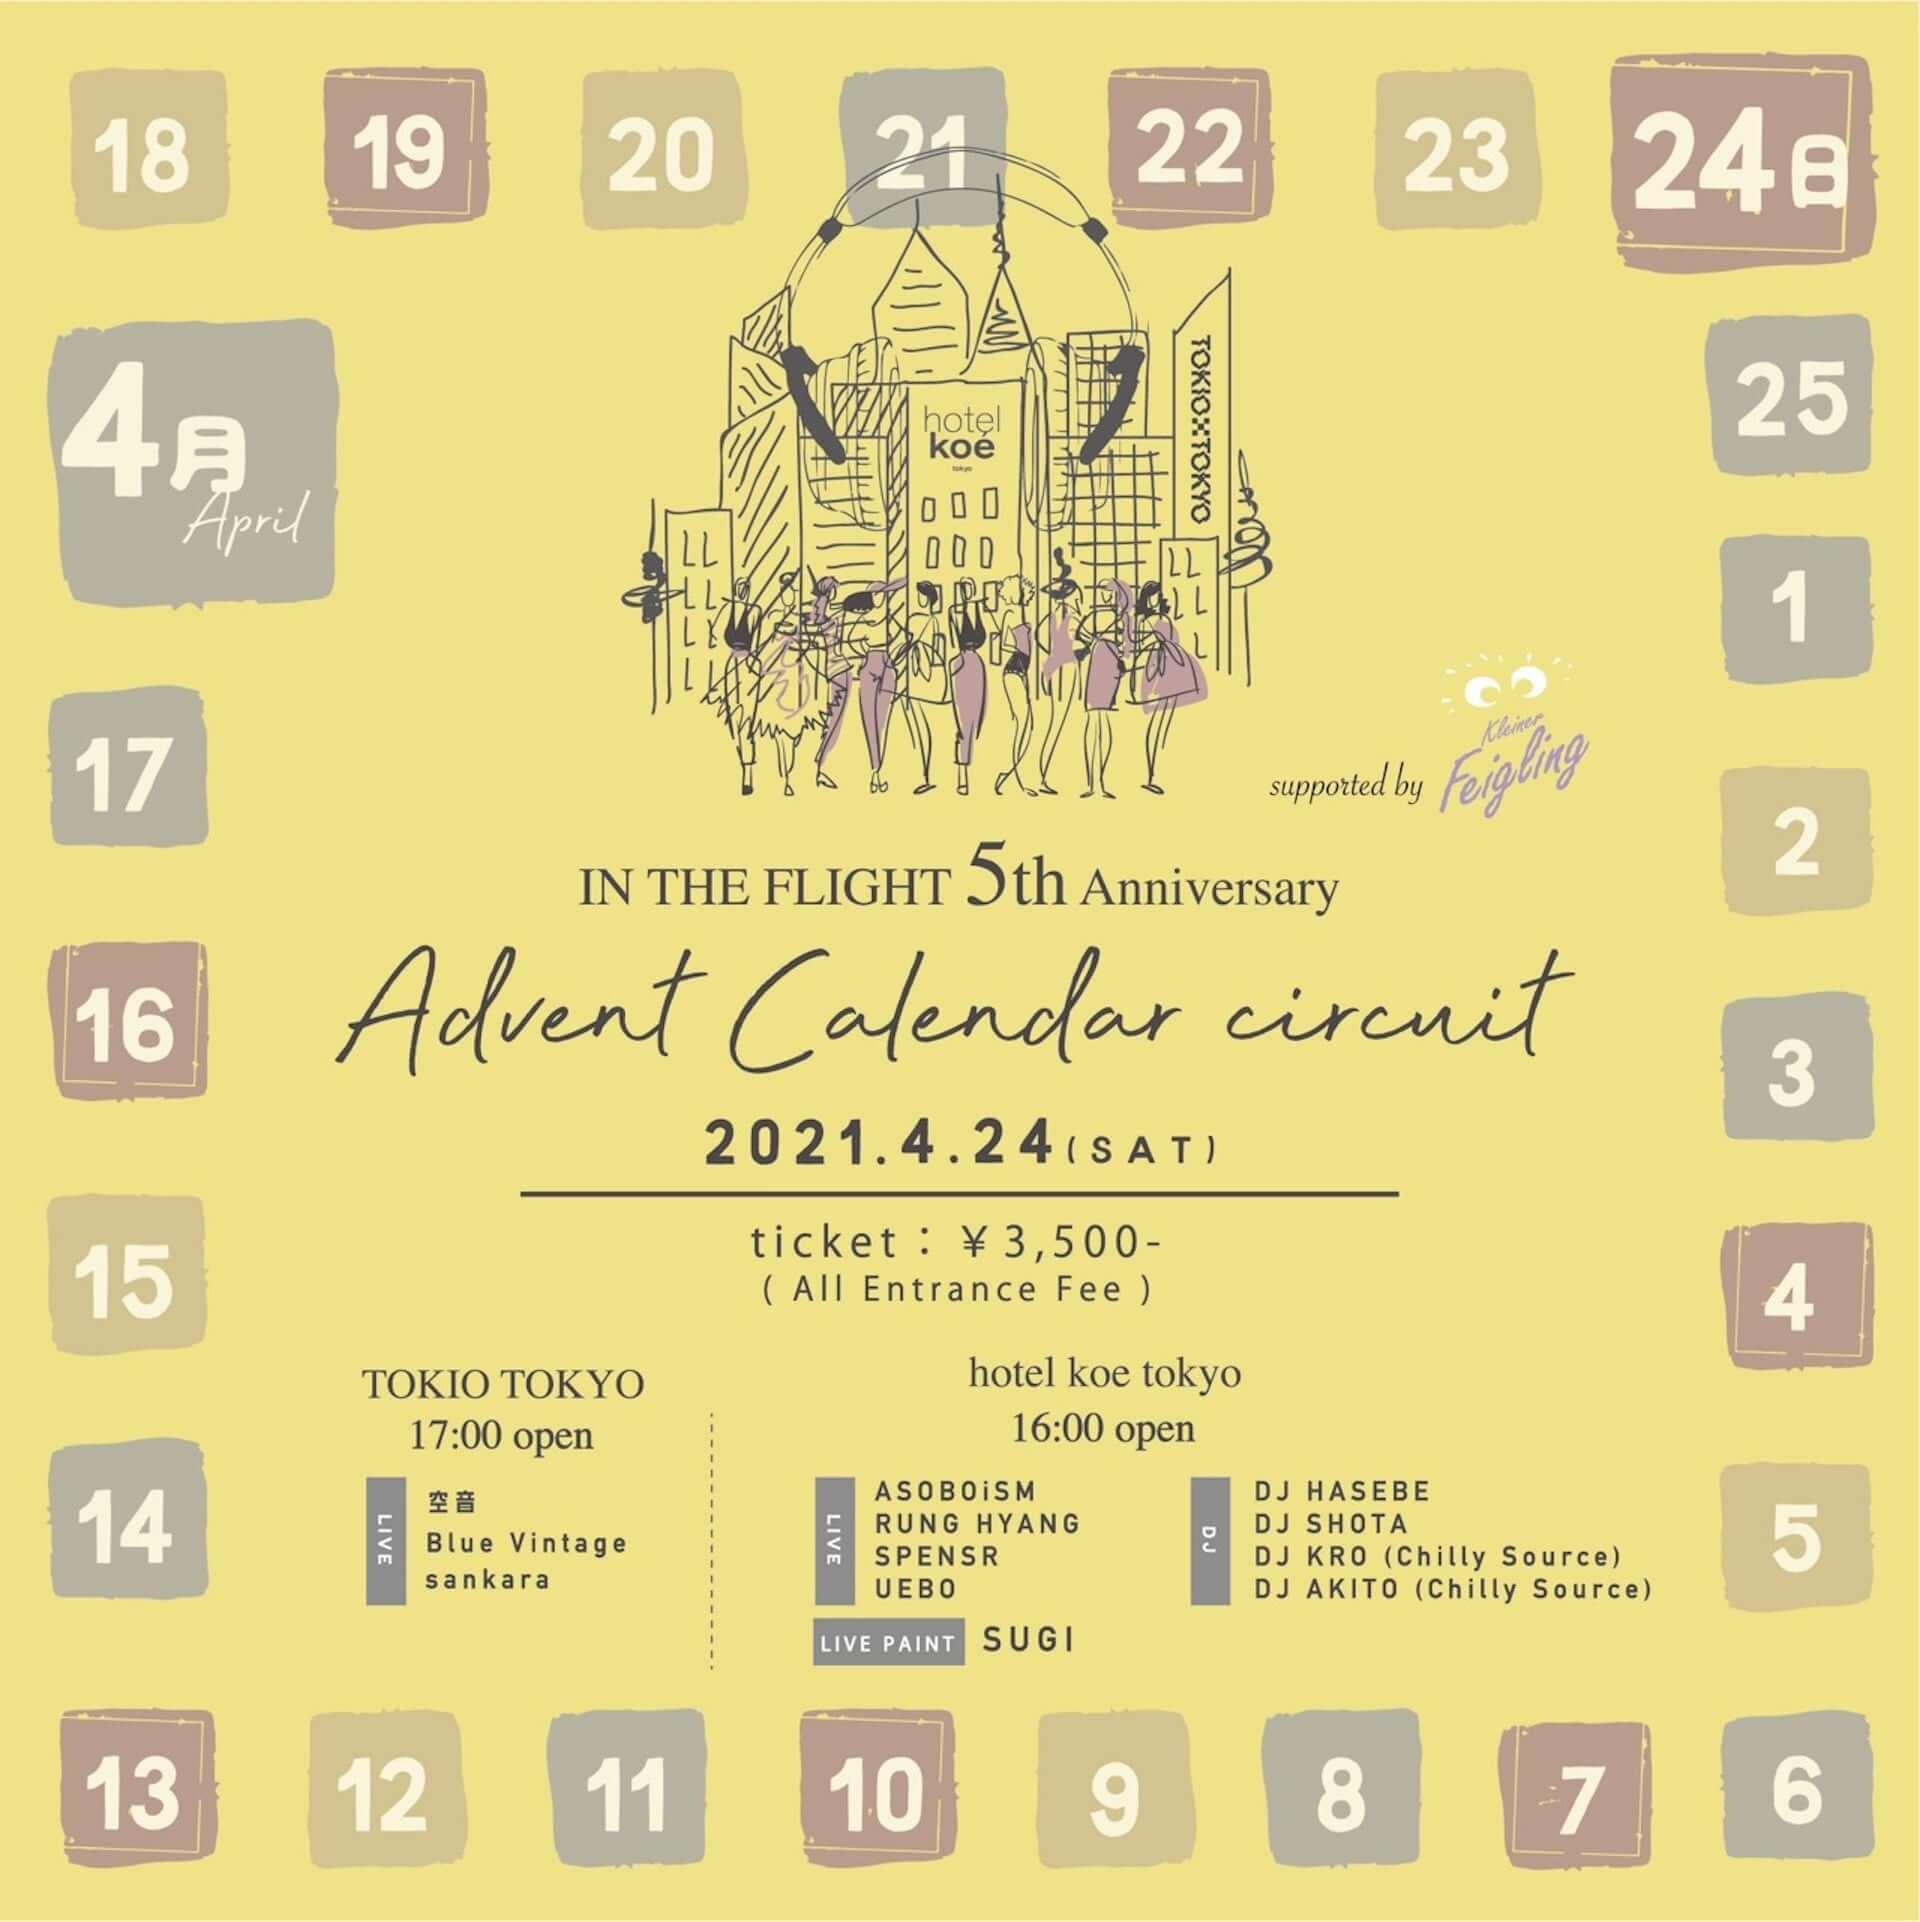 IN THE FLIGHTの5周年記念イベントにsumikaが出演決定!プレイベントには空音、ASOBOiSM、RUNG HYANGらが登場 music210324_intheflight5th_6-1920x1922